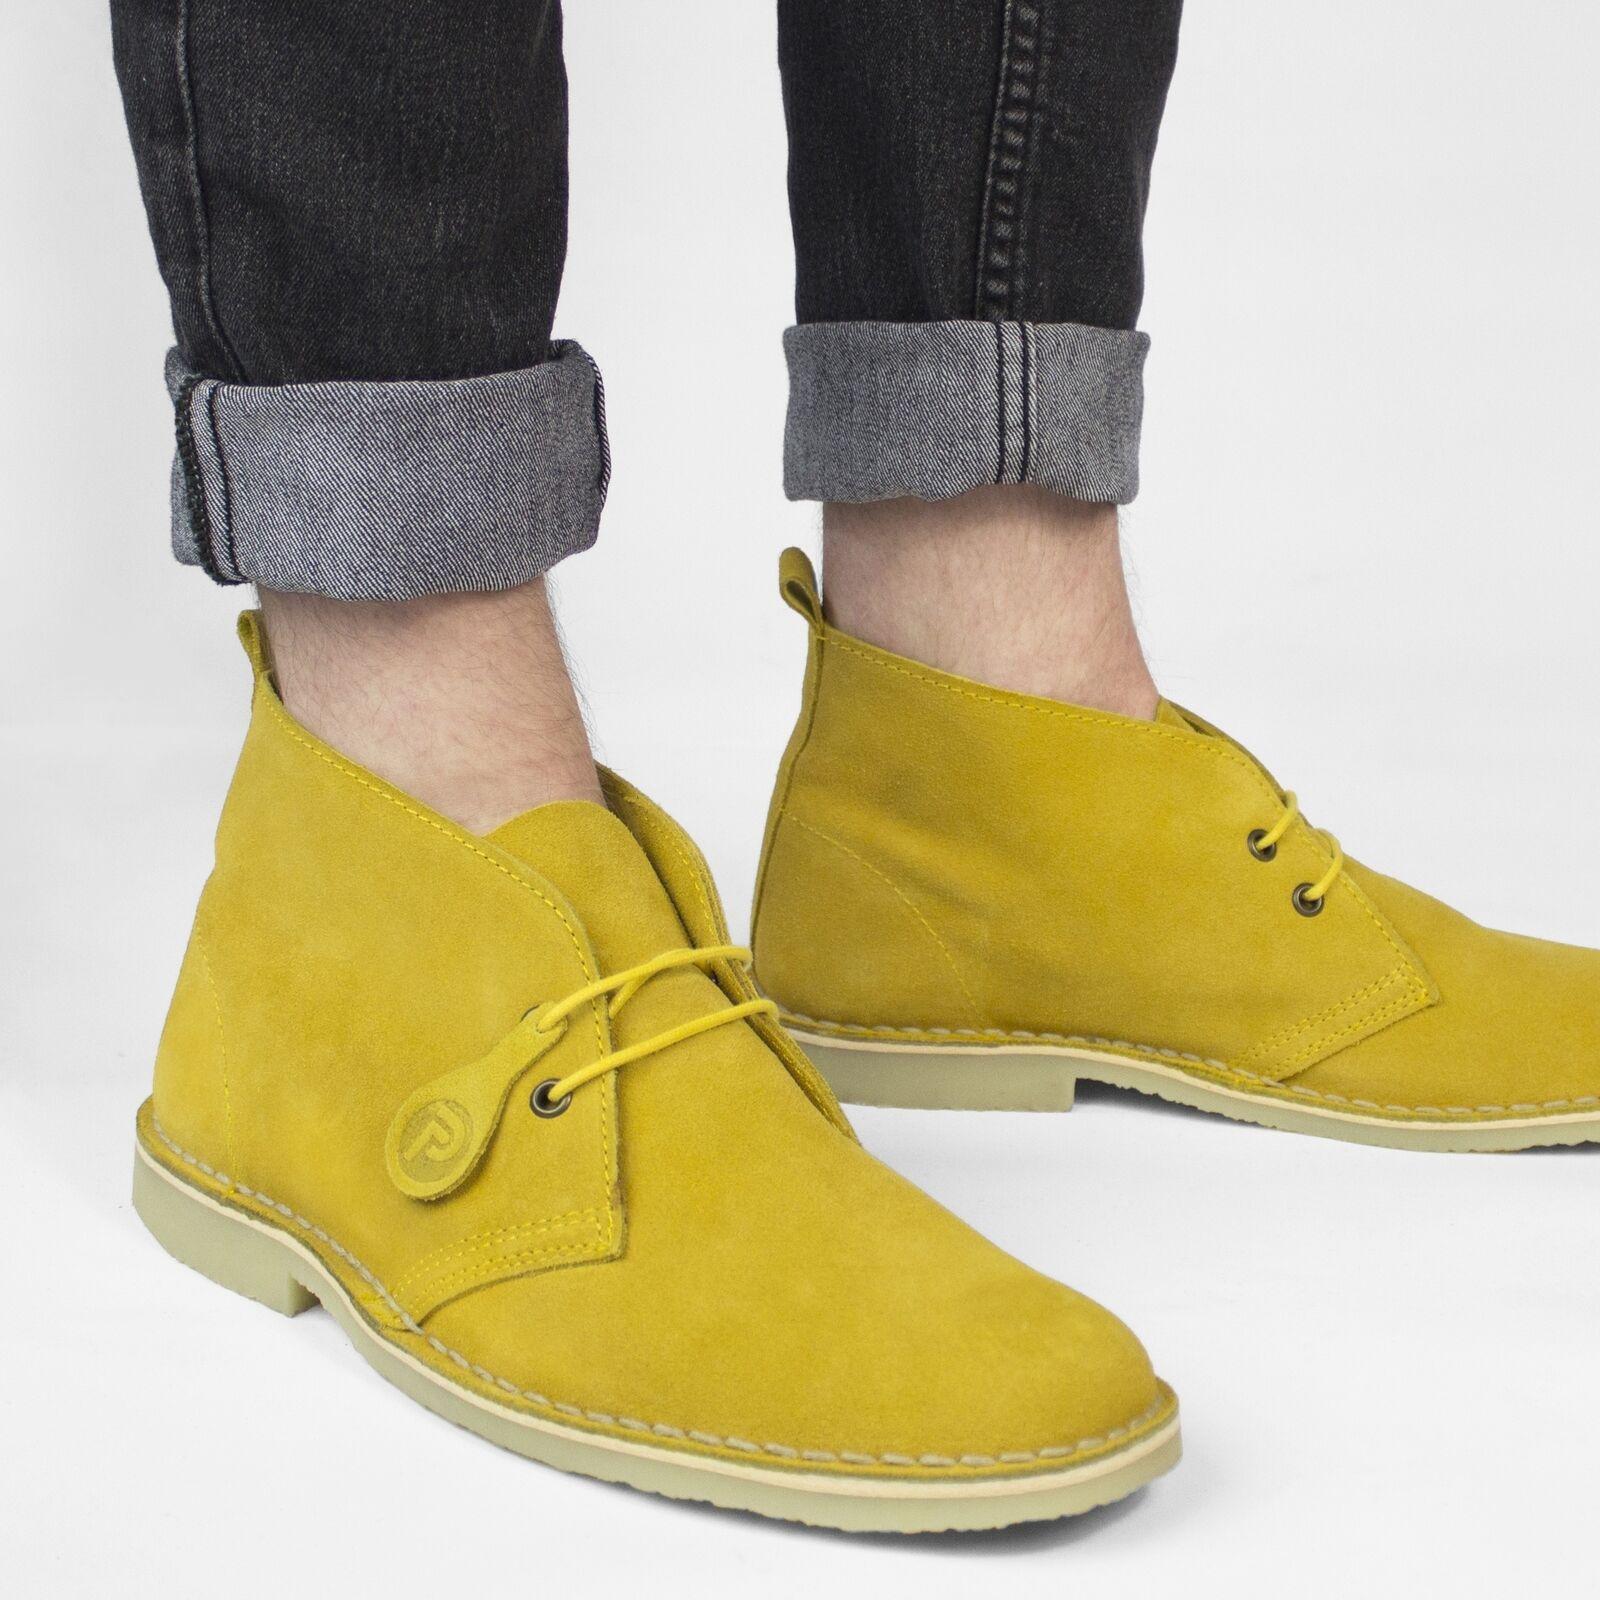 Popps COLOUR Unisex Mens Ladies Summer Suede Chukka Desert Boots Mustard Yellow